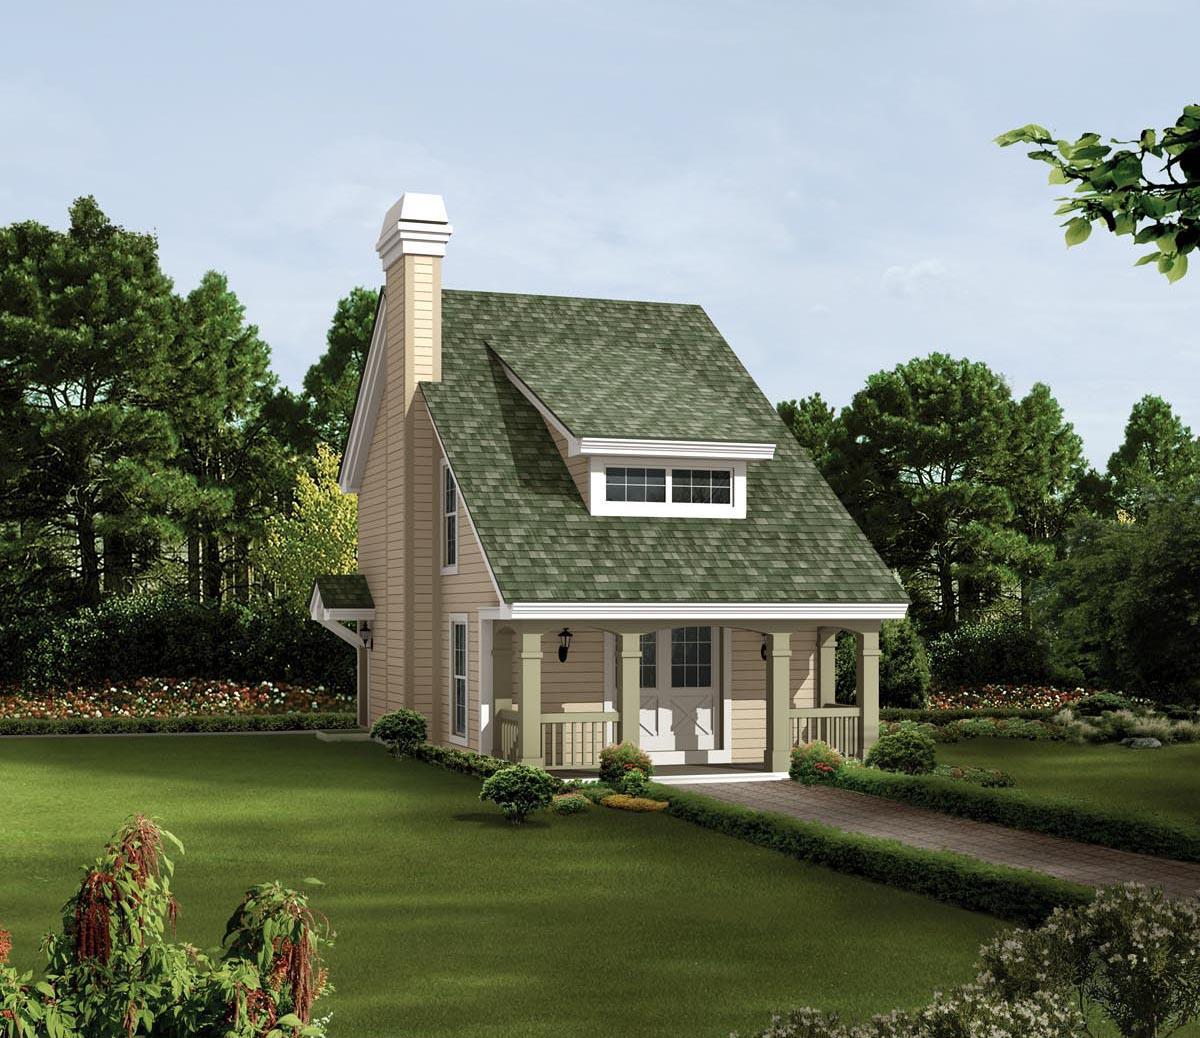 House Plan 95817 at FamilyHomePlanscom